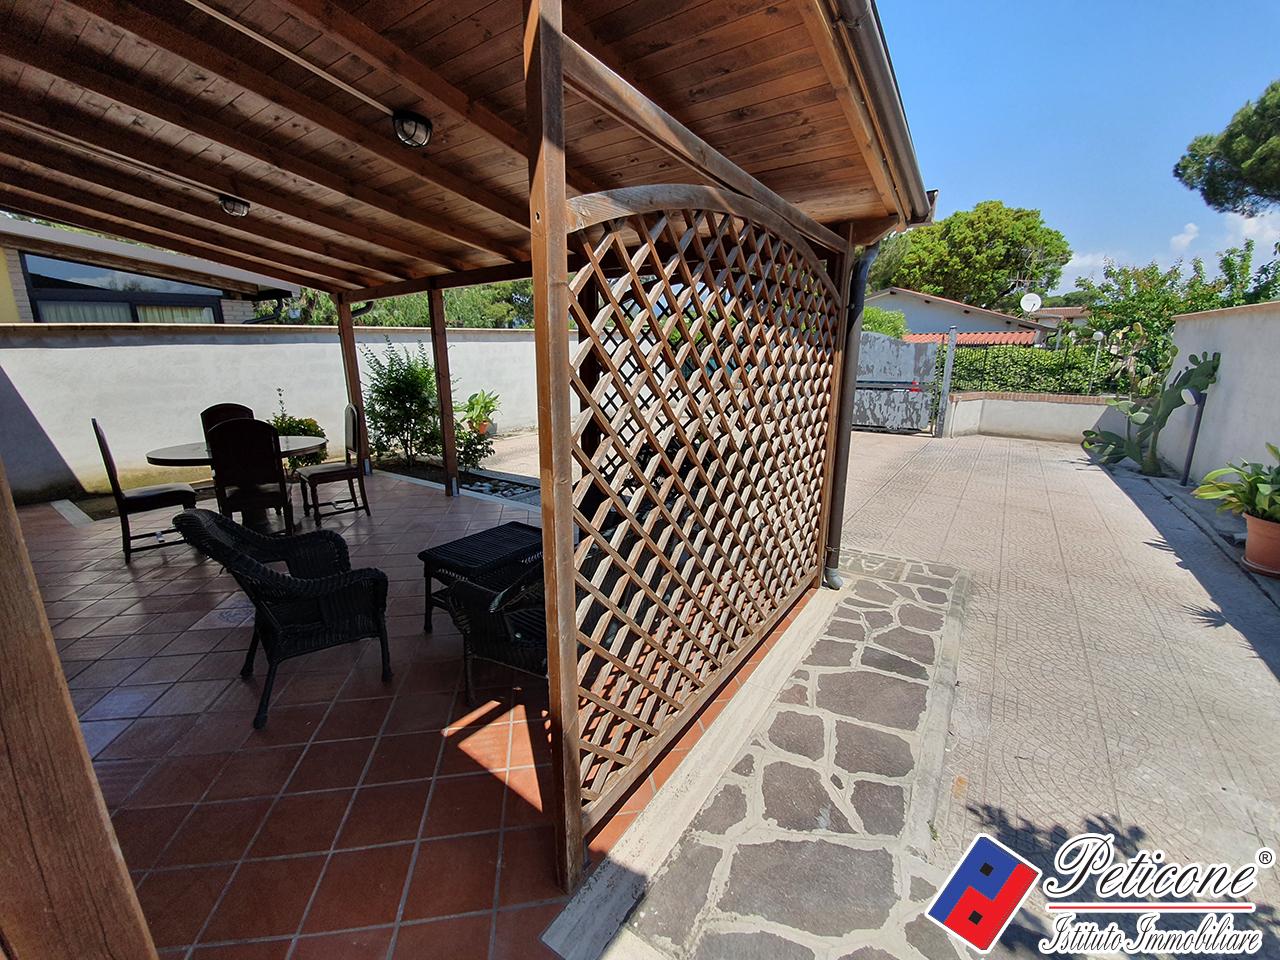 Villa in Vendita a Fondi: 4 locali, 50 mq - Foto 11